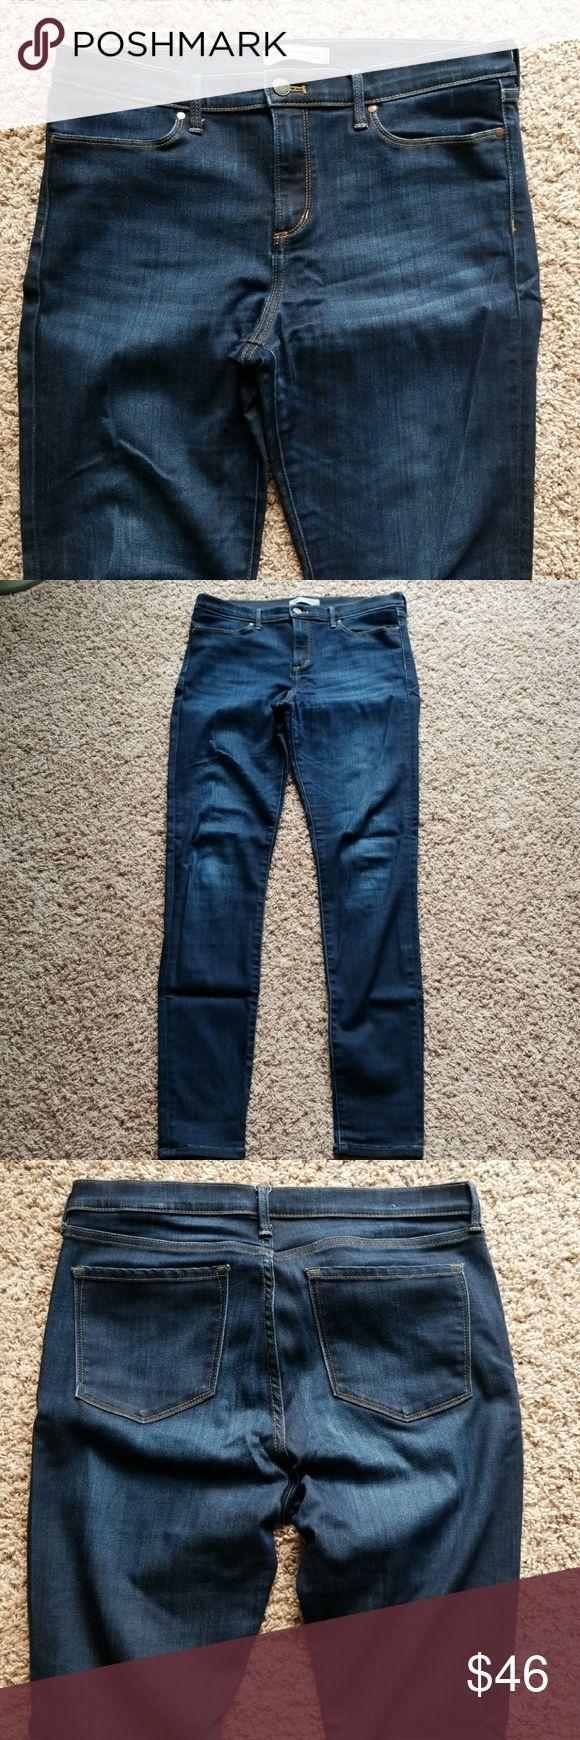 Banana Republic legging fit jean 31long Banana Republic legginf fit jean in size 31 LONG. Soft, stretchy fabric. Beautiful dark wash. Excellent condition! Banana Republic Jeans Skinny